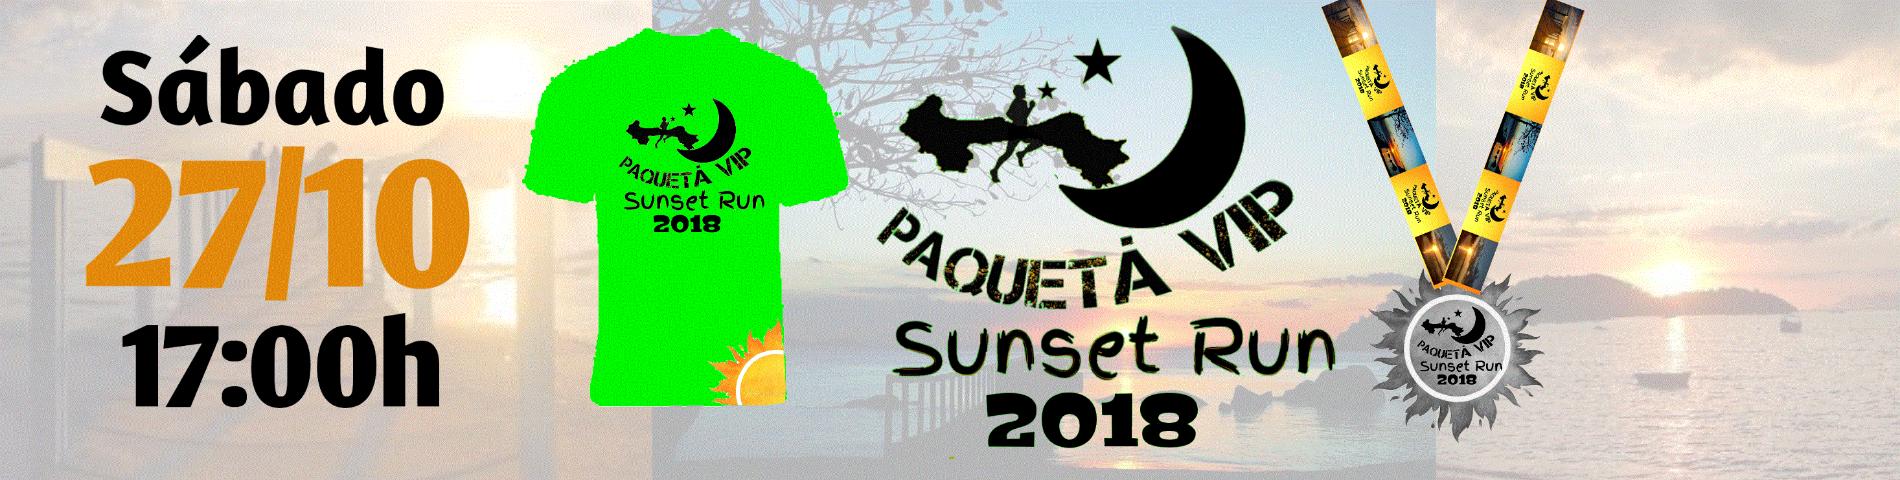 PAQUETA VIP SUNSET RUN 2018 - Imagem de topo